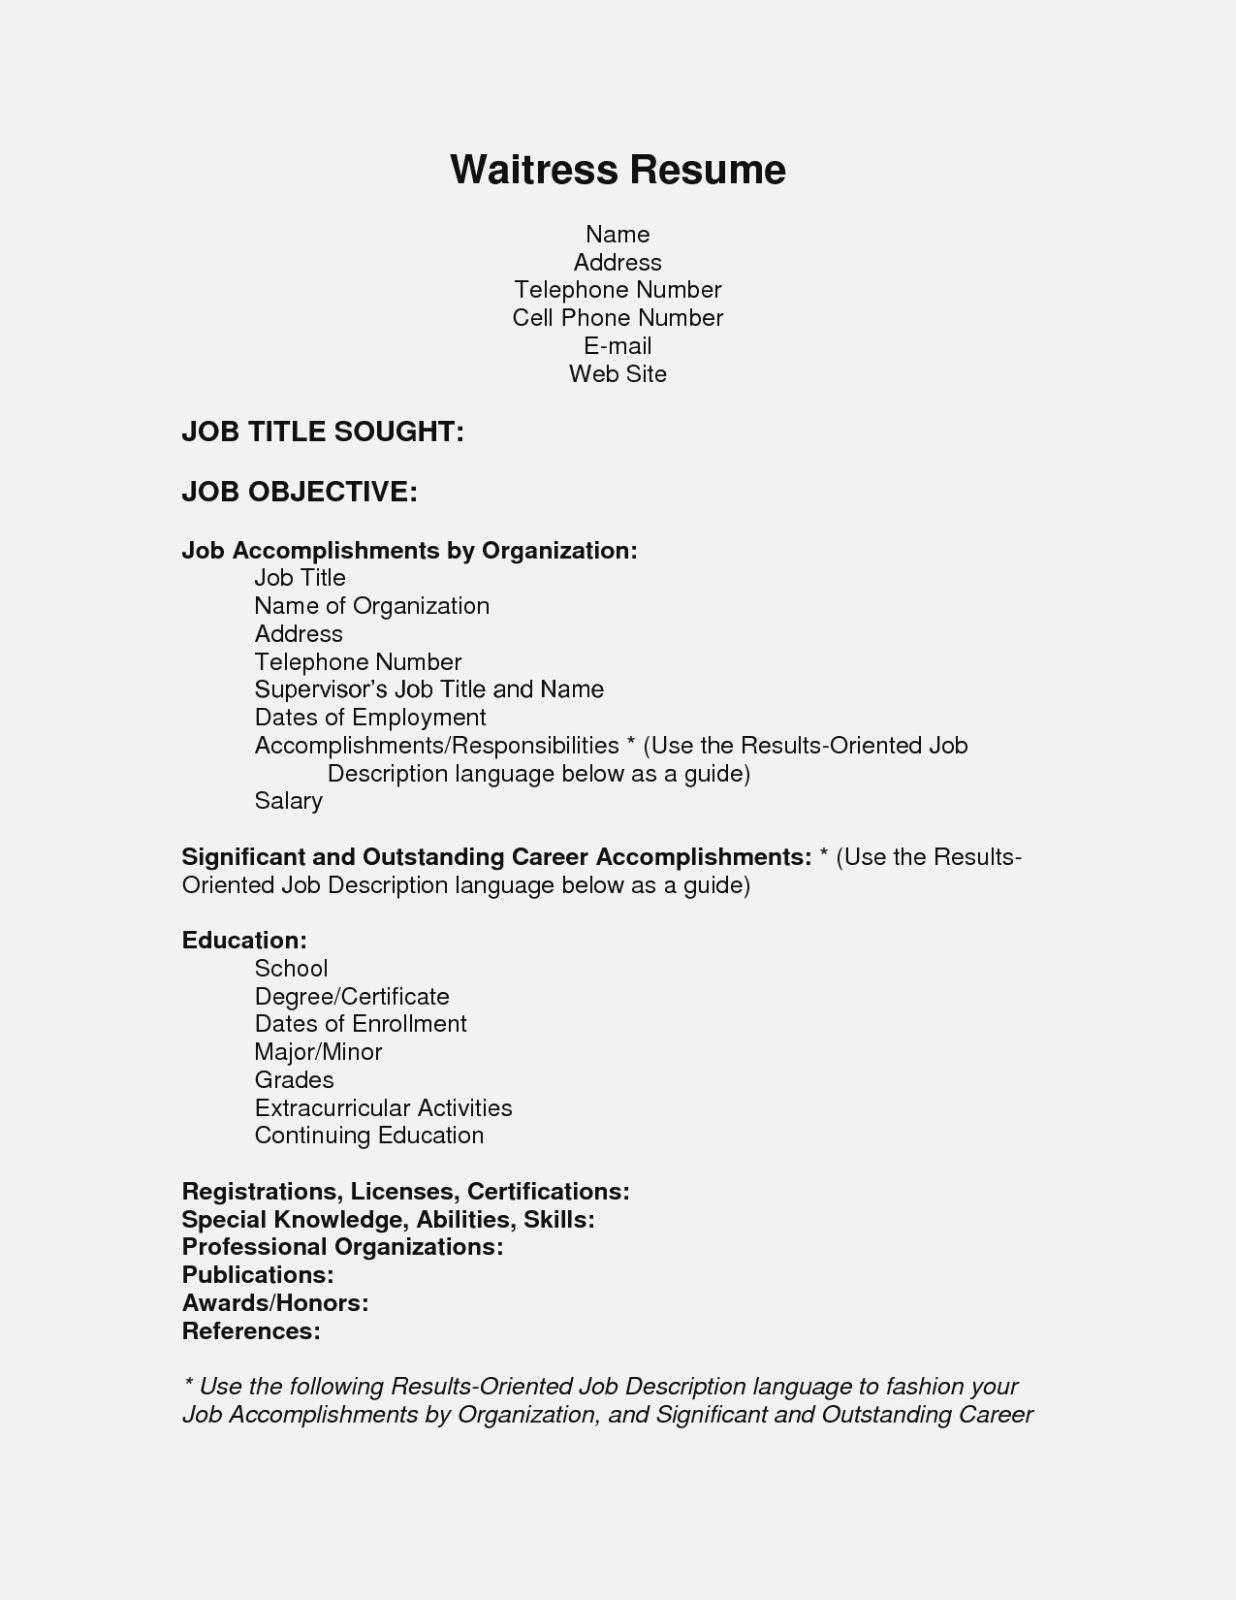 Hostess Job Description for Resume Elegant Hostess Job in